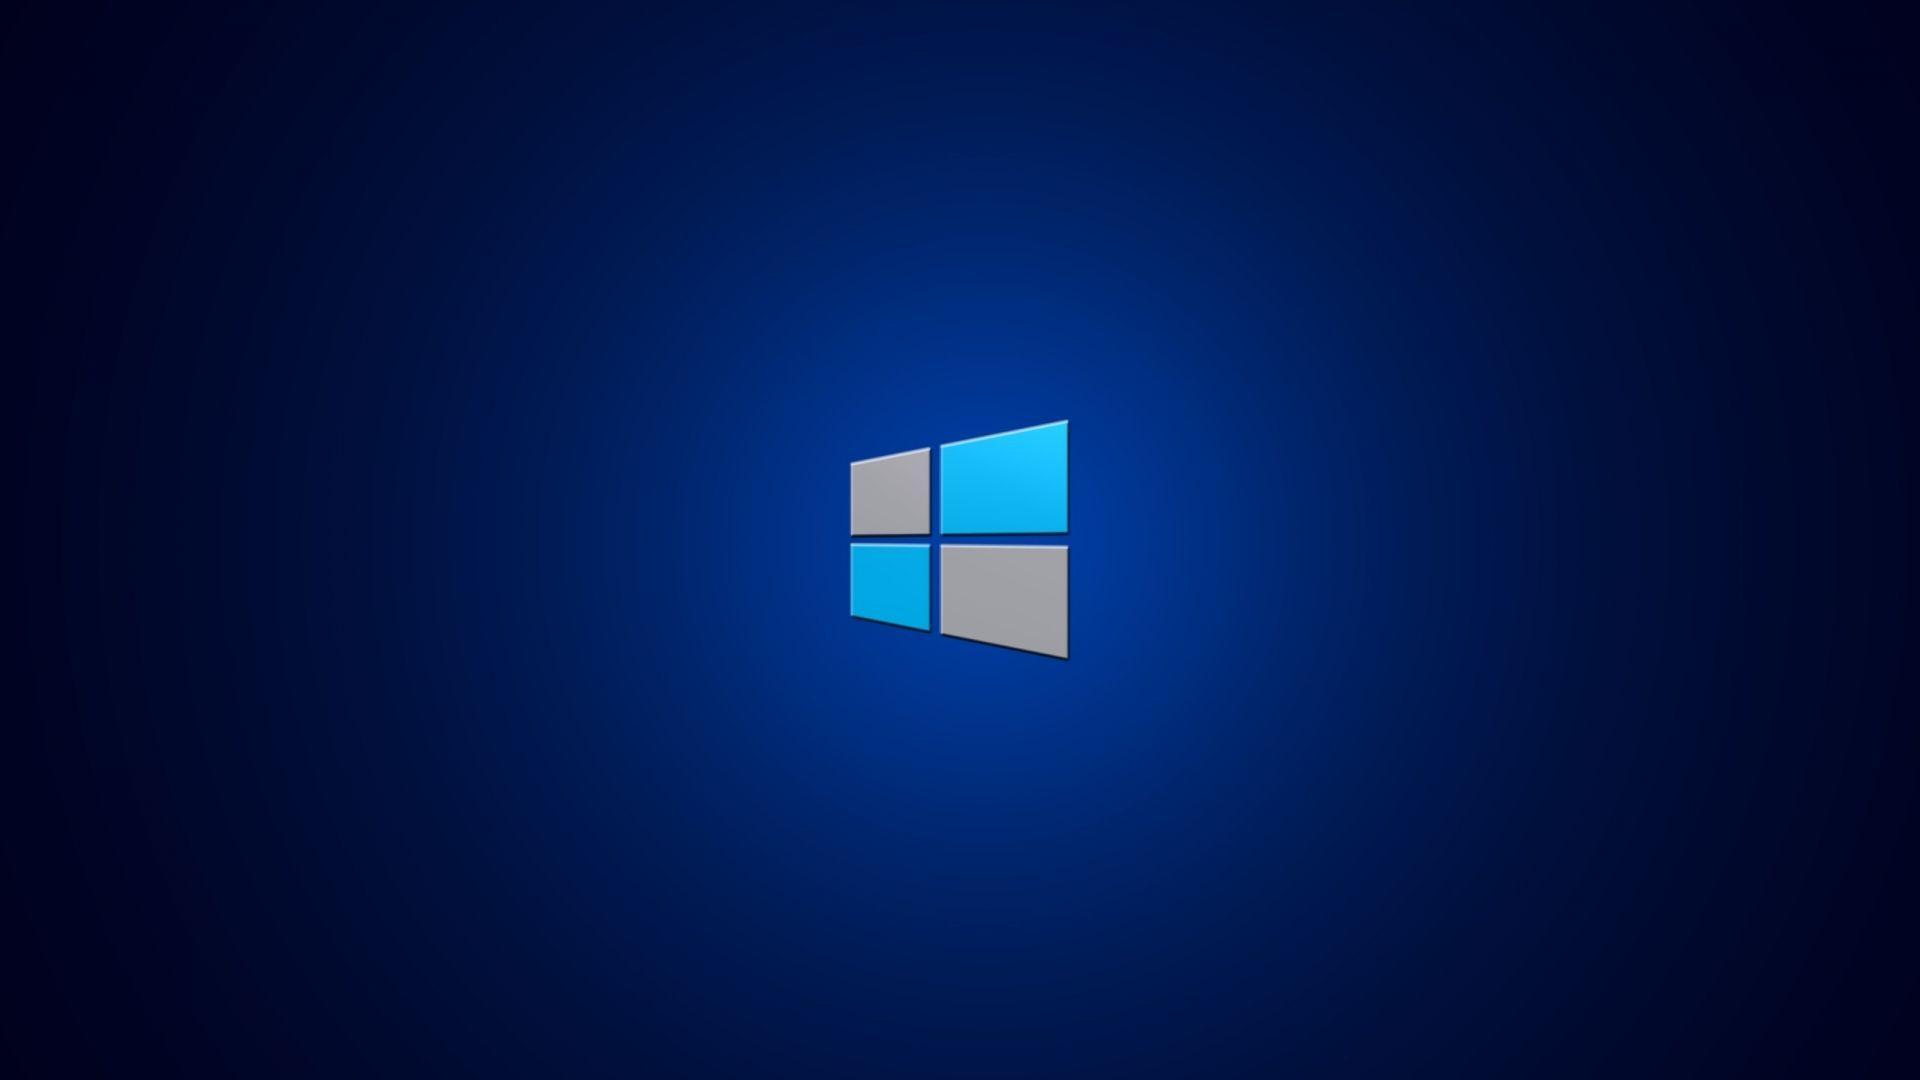 Windows 8 1 Black Backgrounds Wallpaper Cave